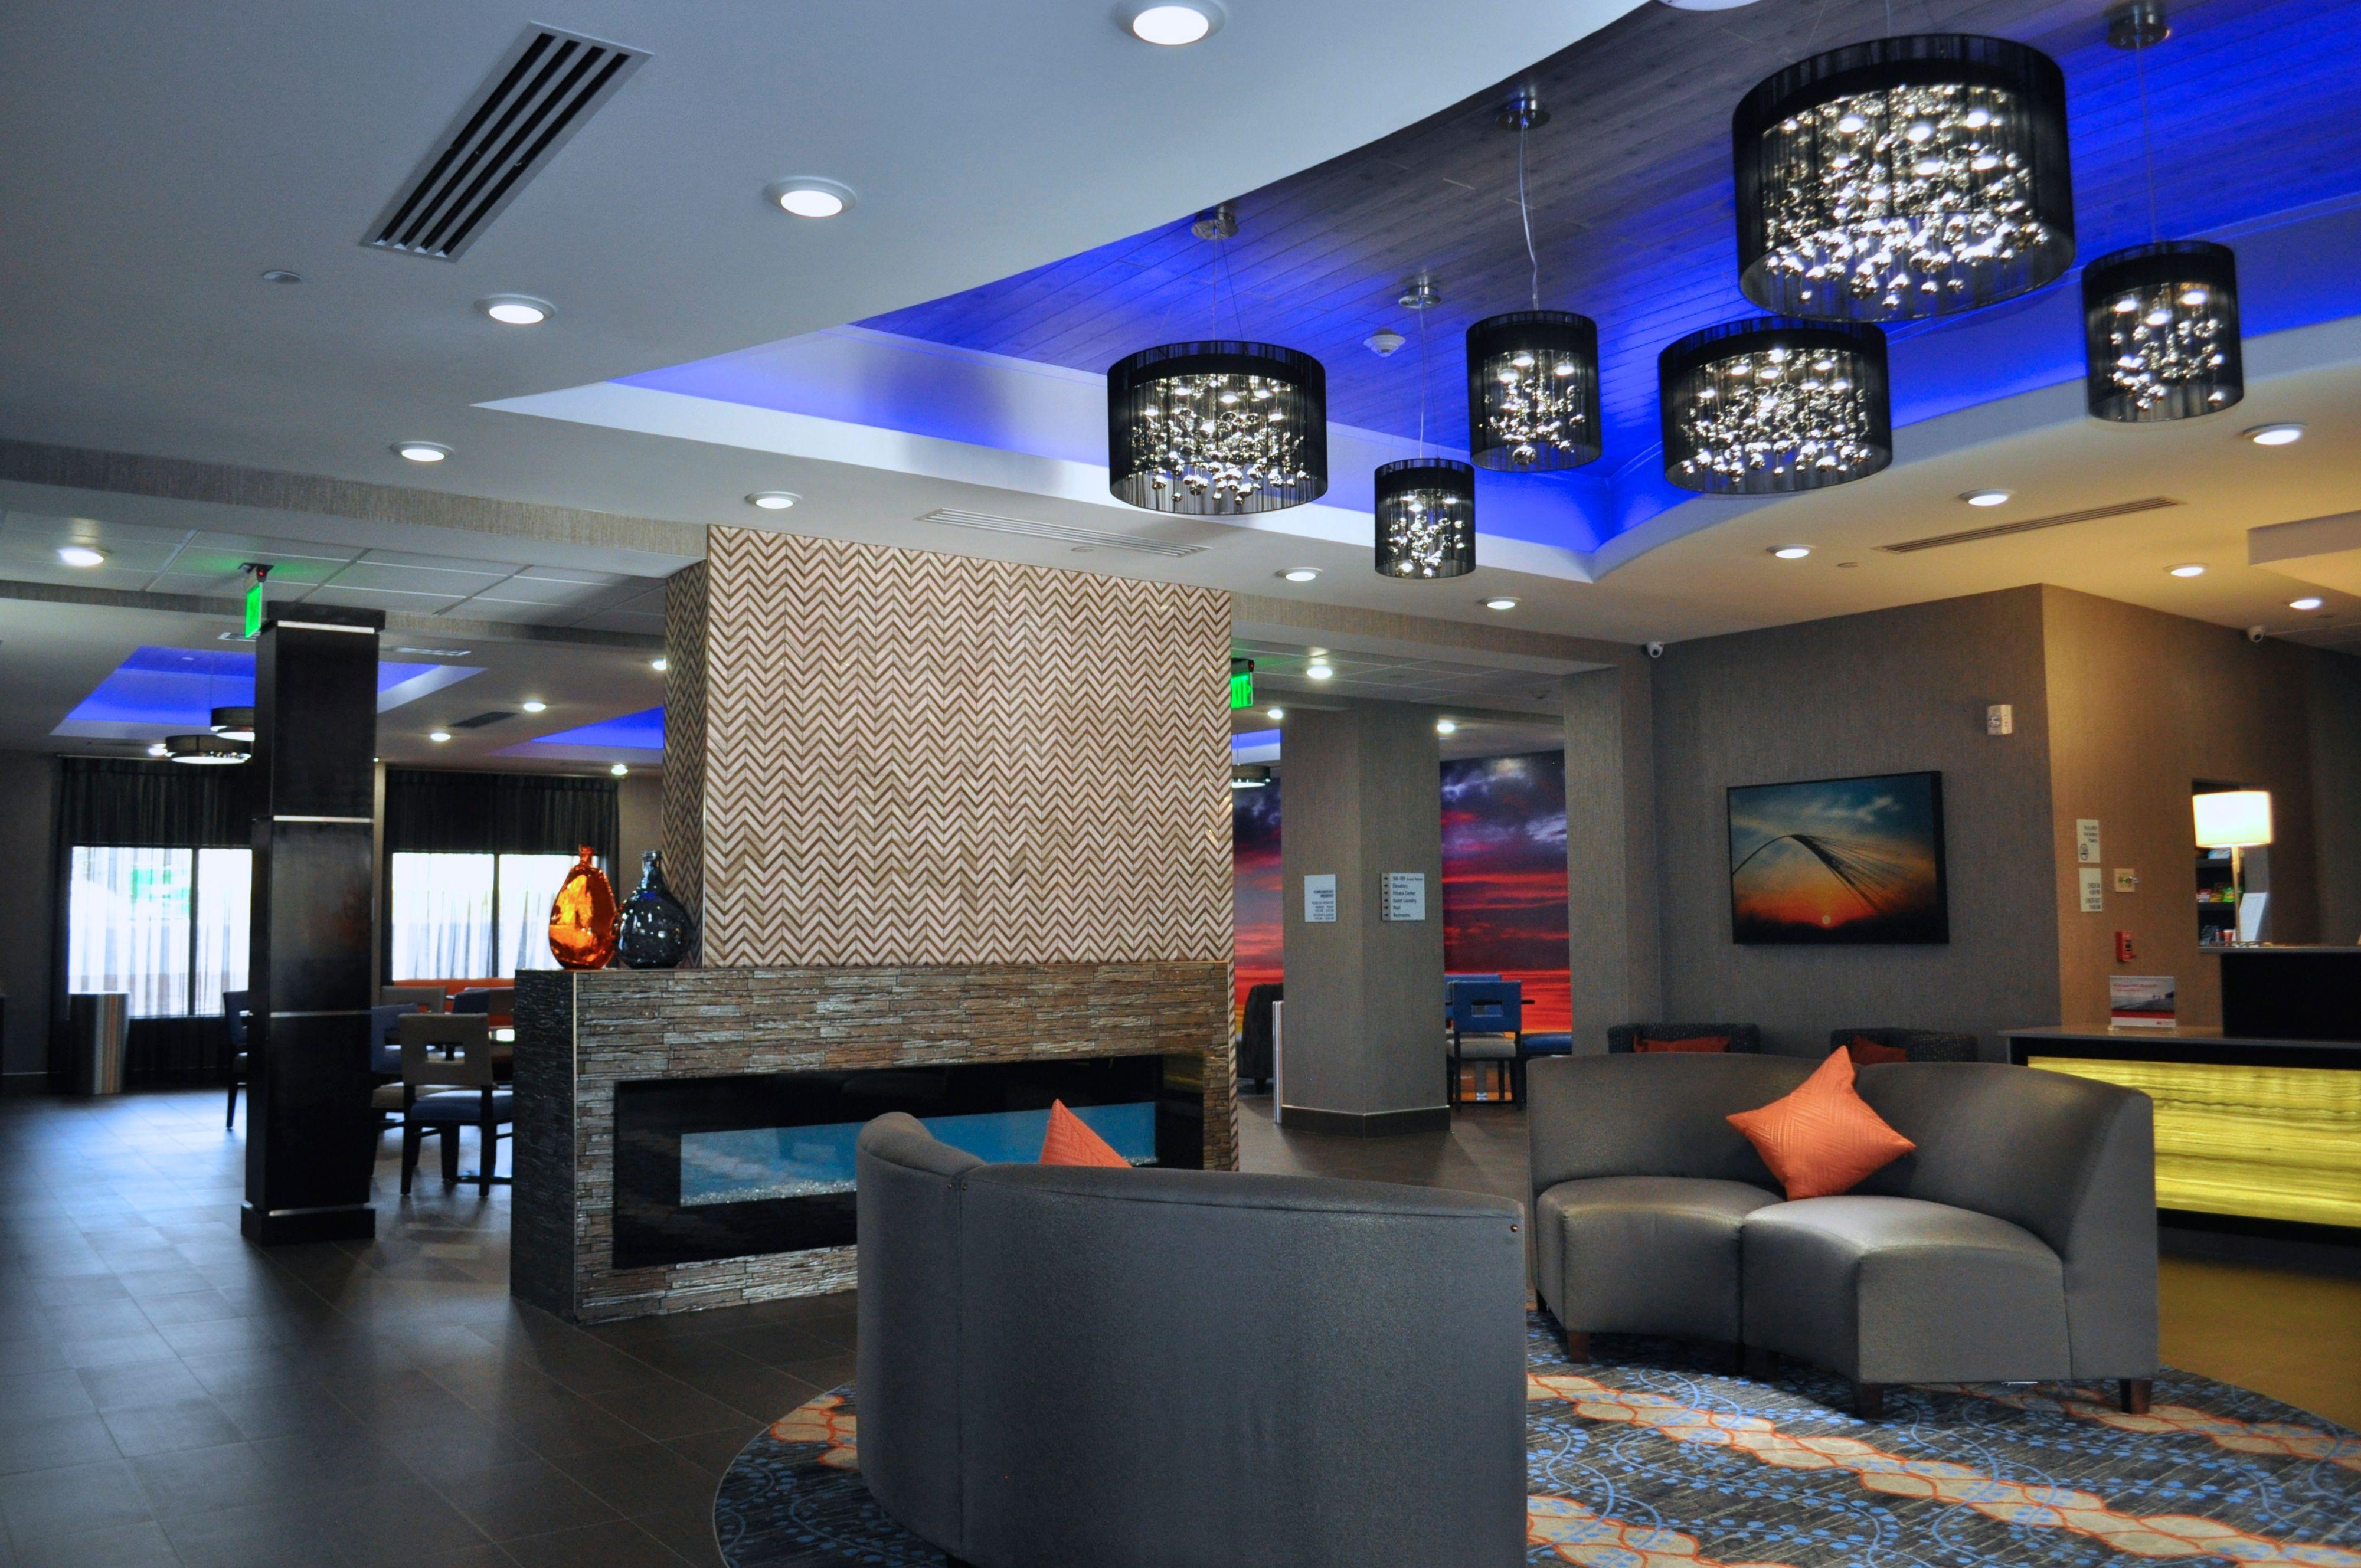 Holiday Inn Express & Suites Oklahoma City Southeast - I-35 image 3